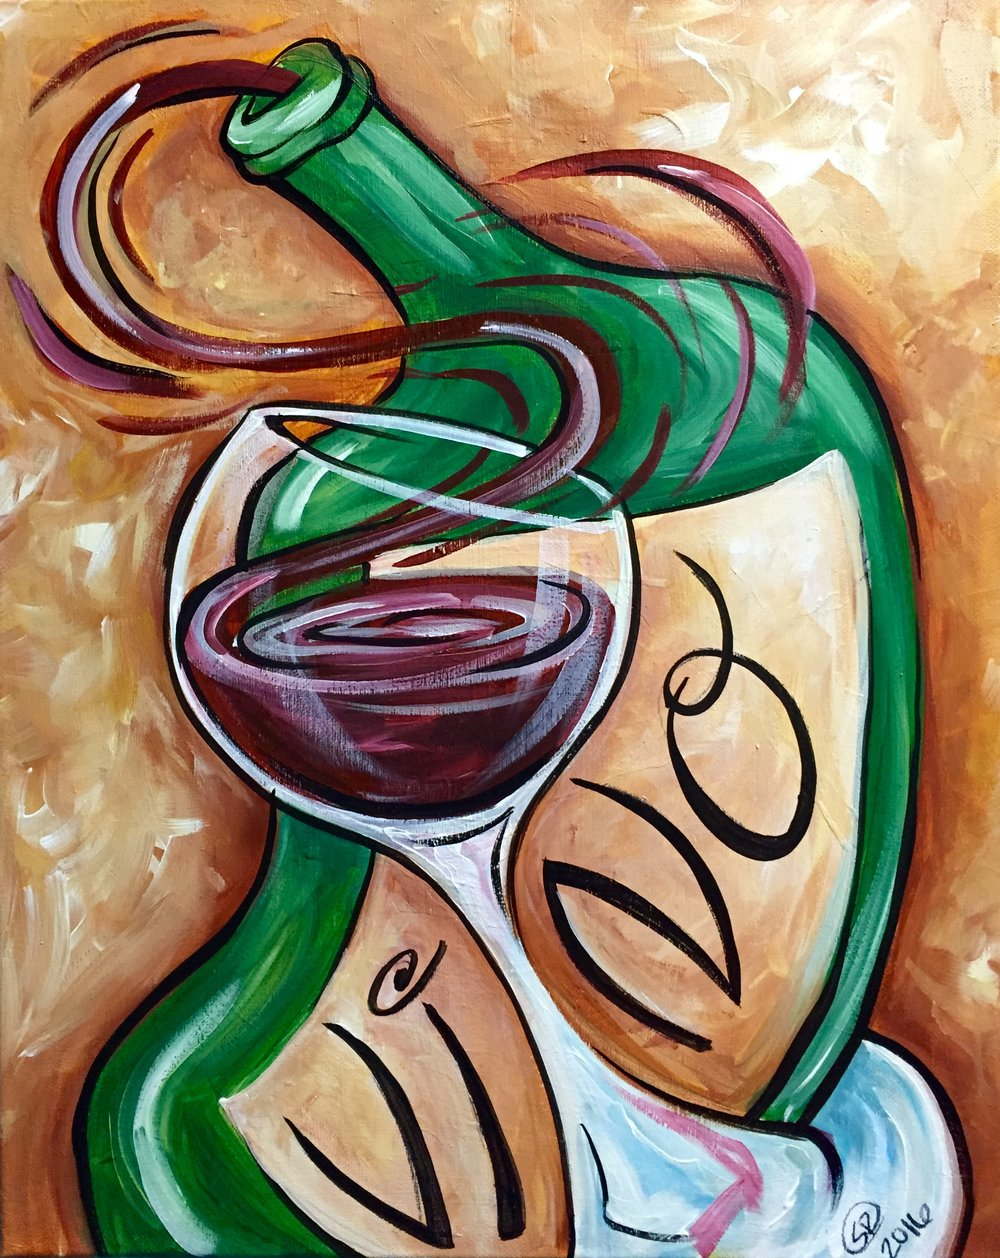 Ballo Vino (Shelly) -03.jpg